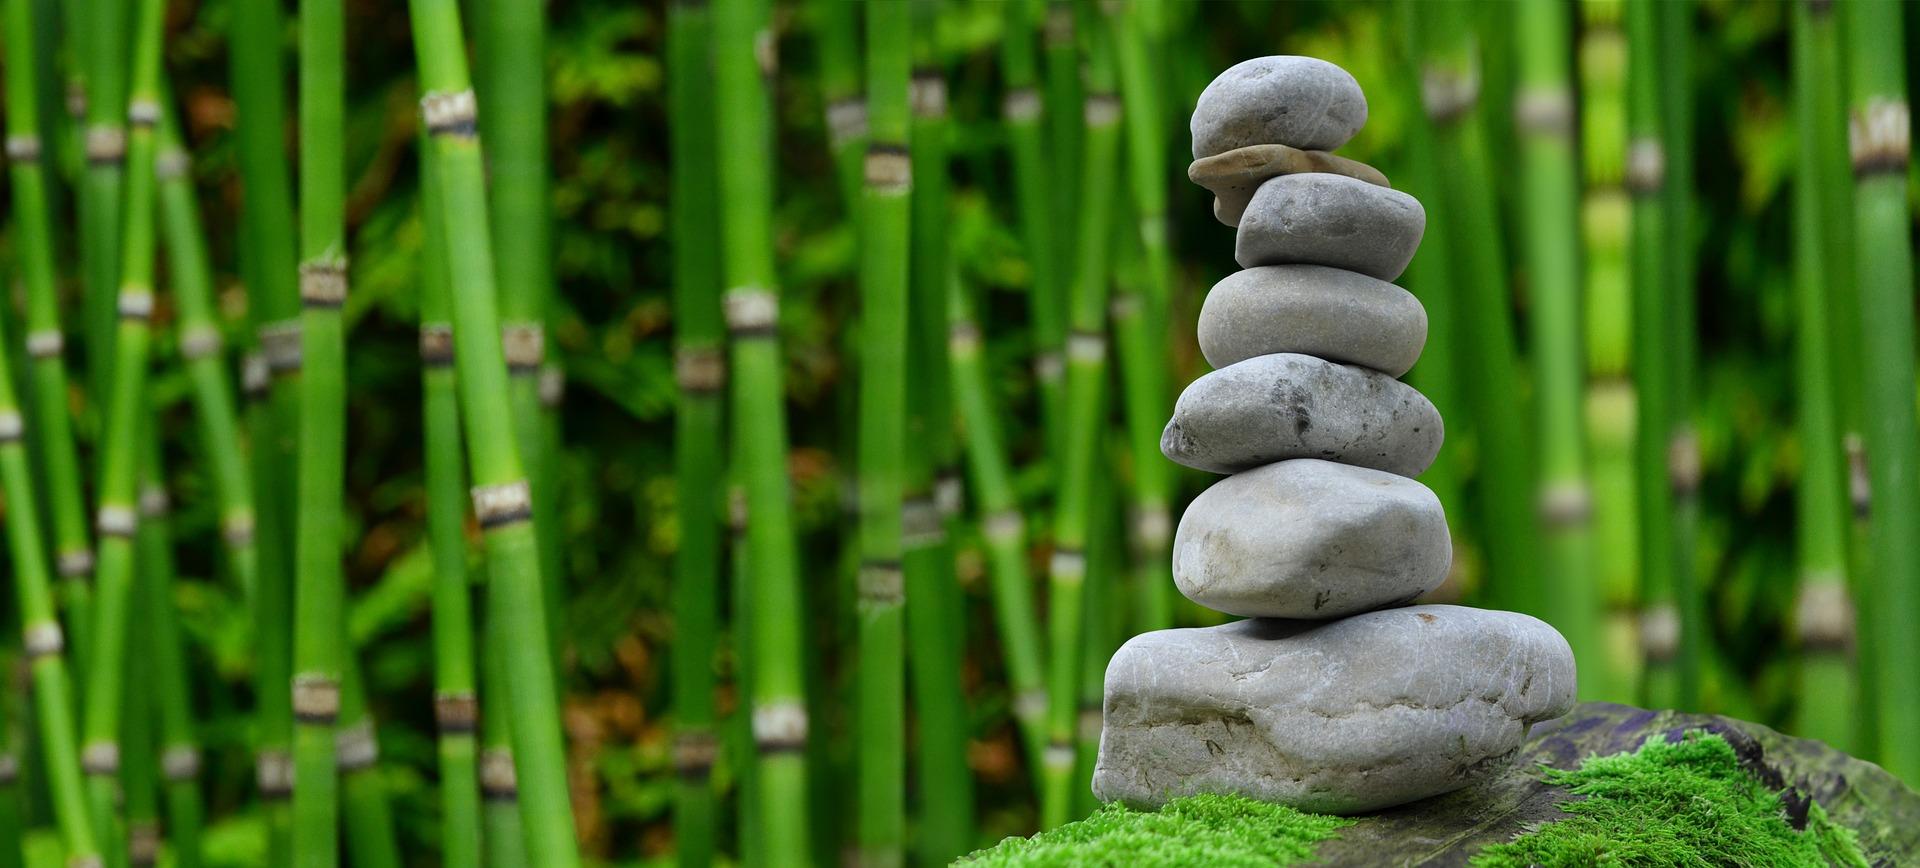 matelas anti acariens memoire de forme bambou latex fibre de coco